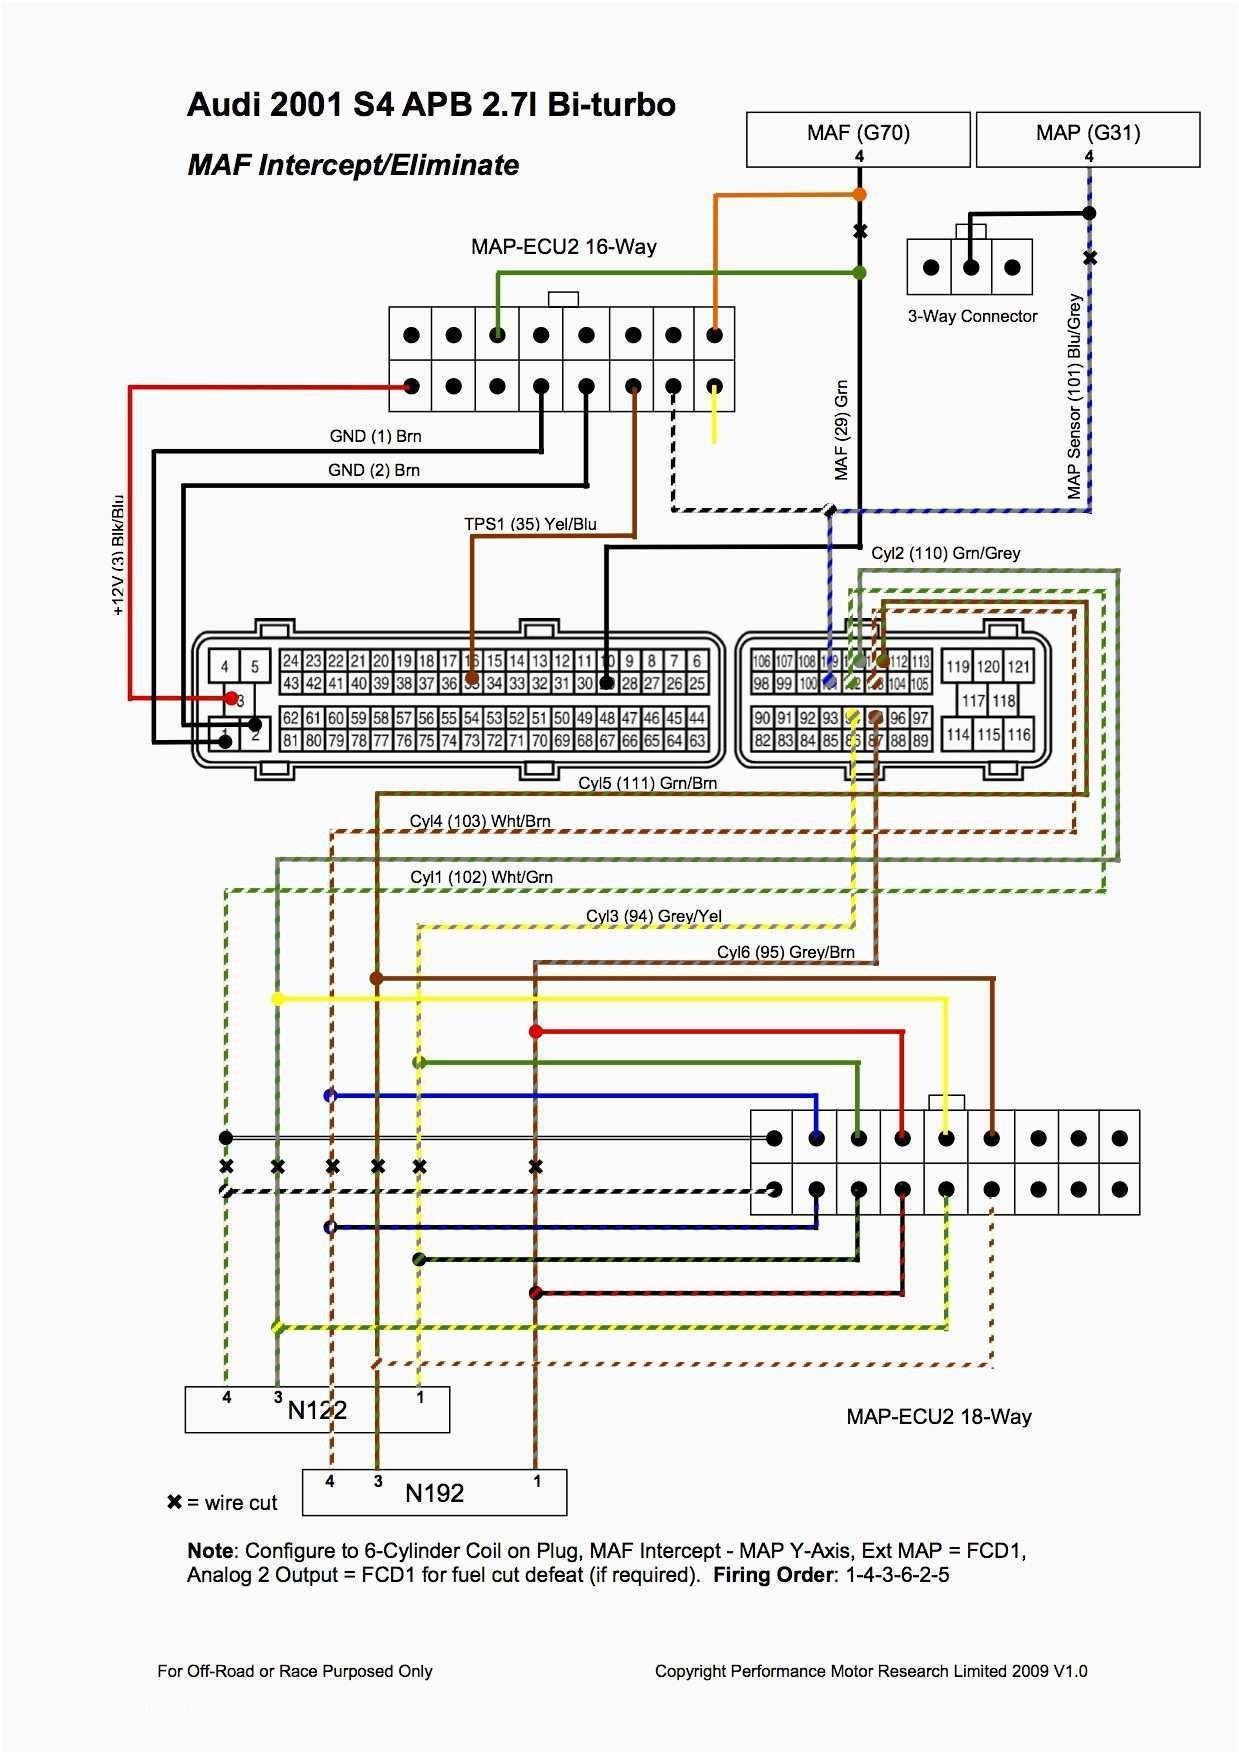 1994 ford F150 Radio Wiring Diagram 1993 Dodge Ram Radio Wiring Wiring Diagram Used Of 1994 ford F150 Radio Wiring Diagram